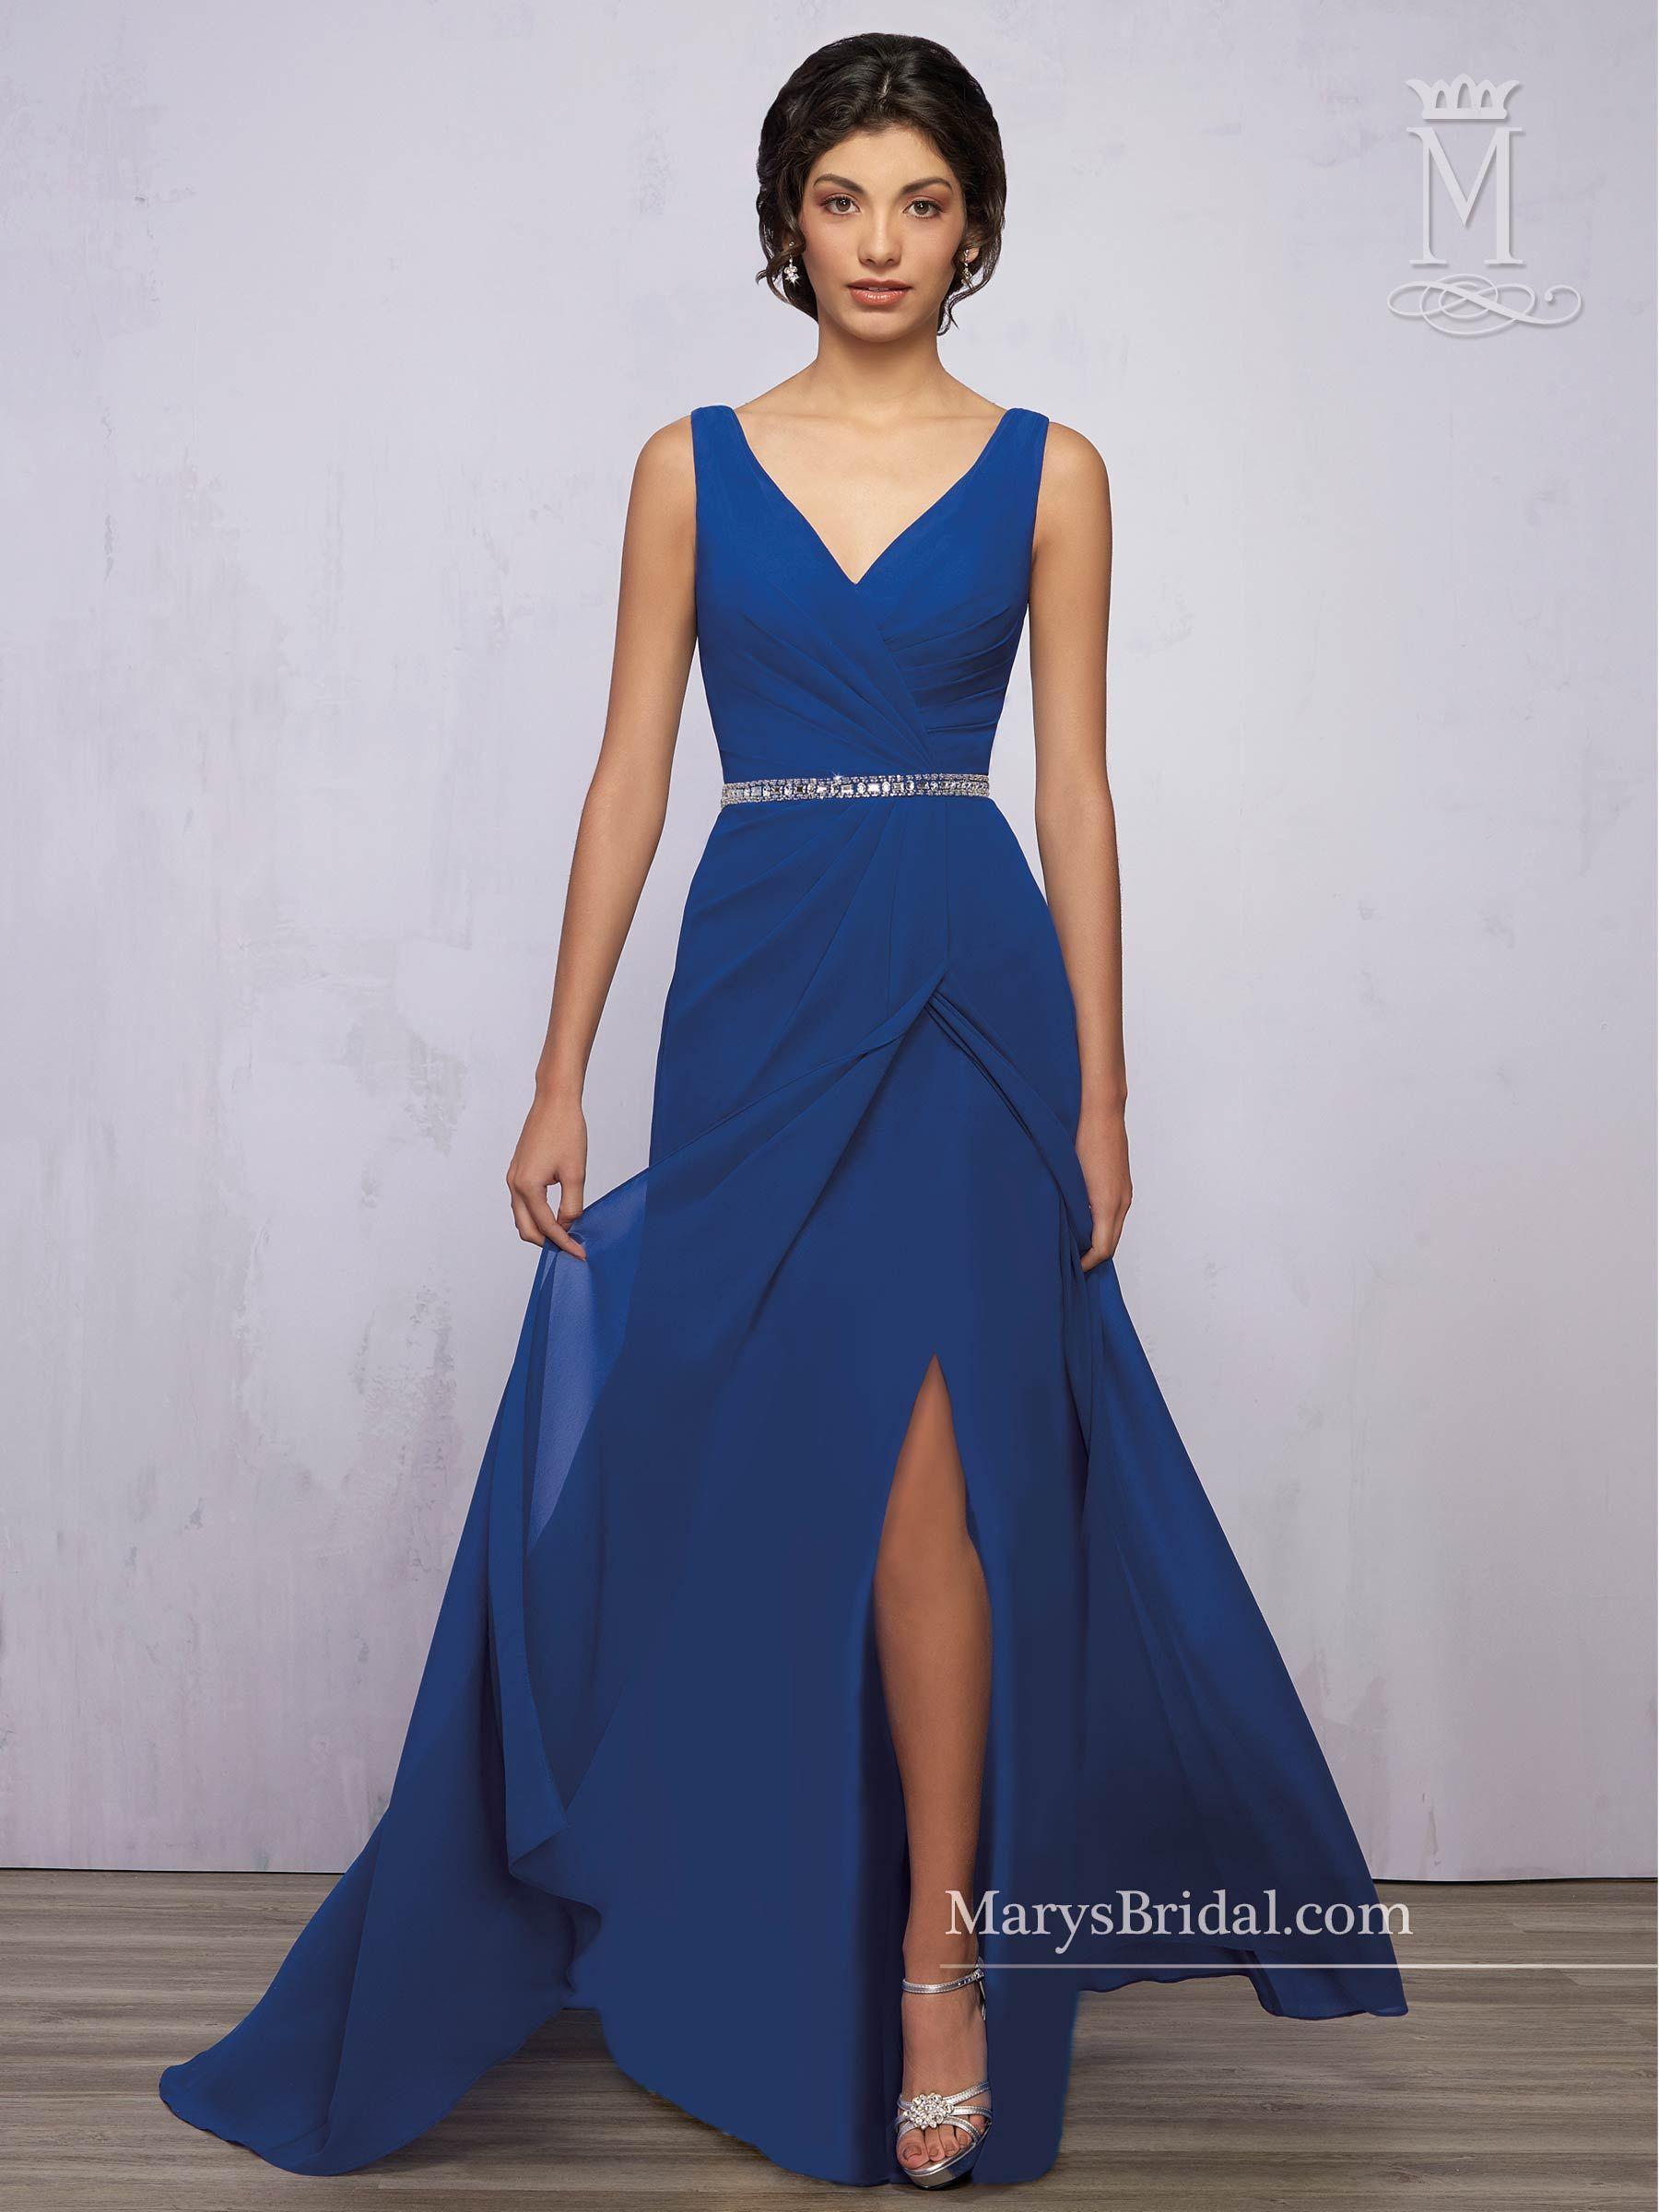 Maryus style id m gowns pinterest chiffon bridesmaid